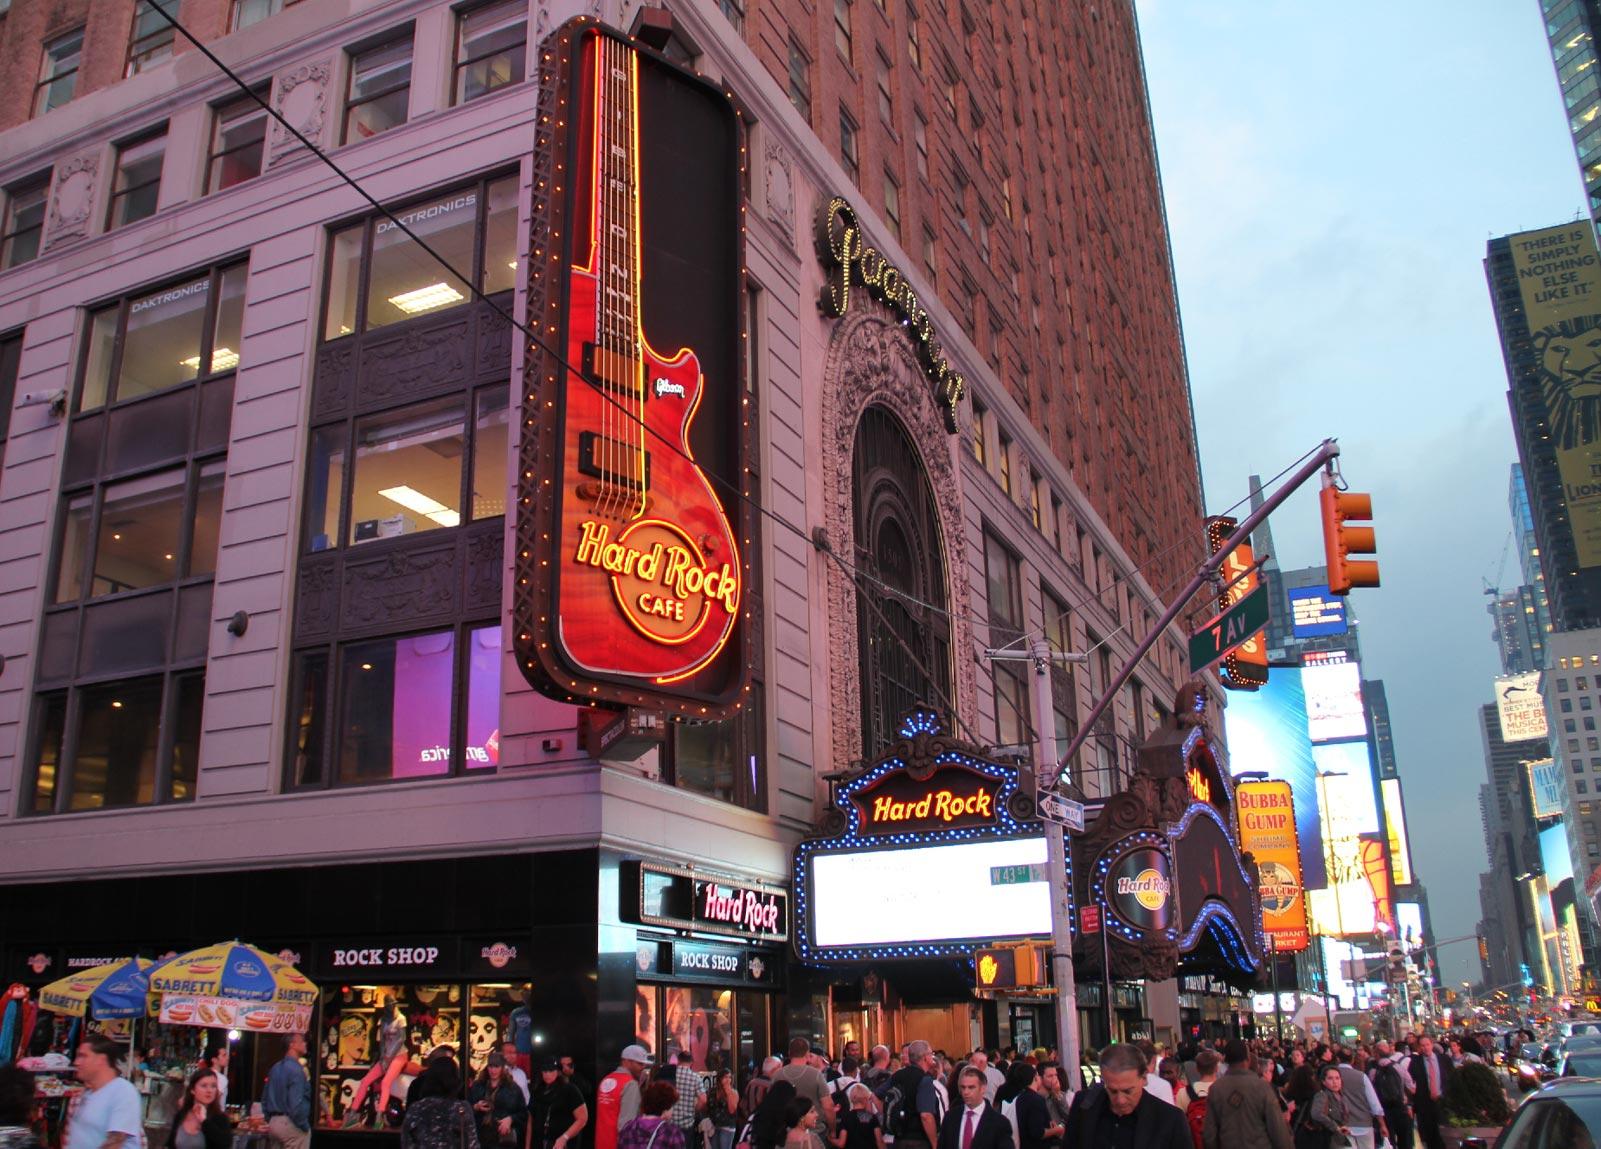 Hard Rock Hotel New York  Hard Rock NYC